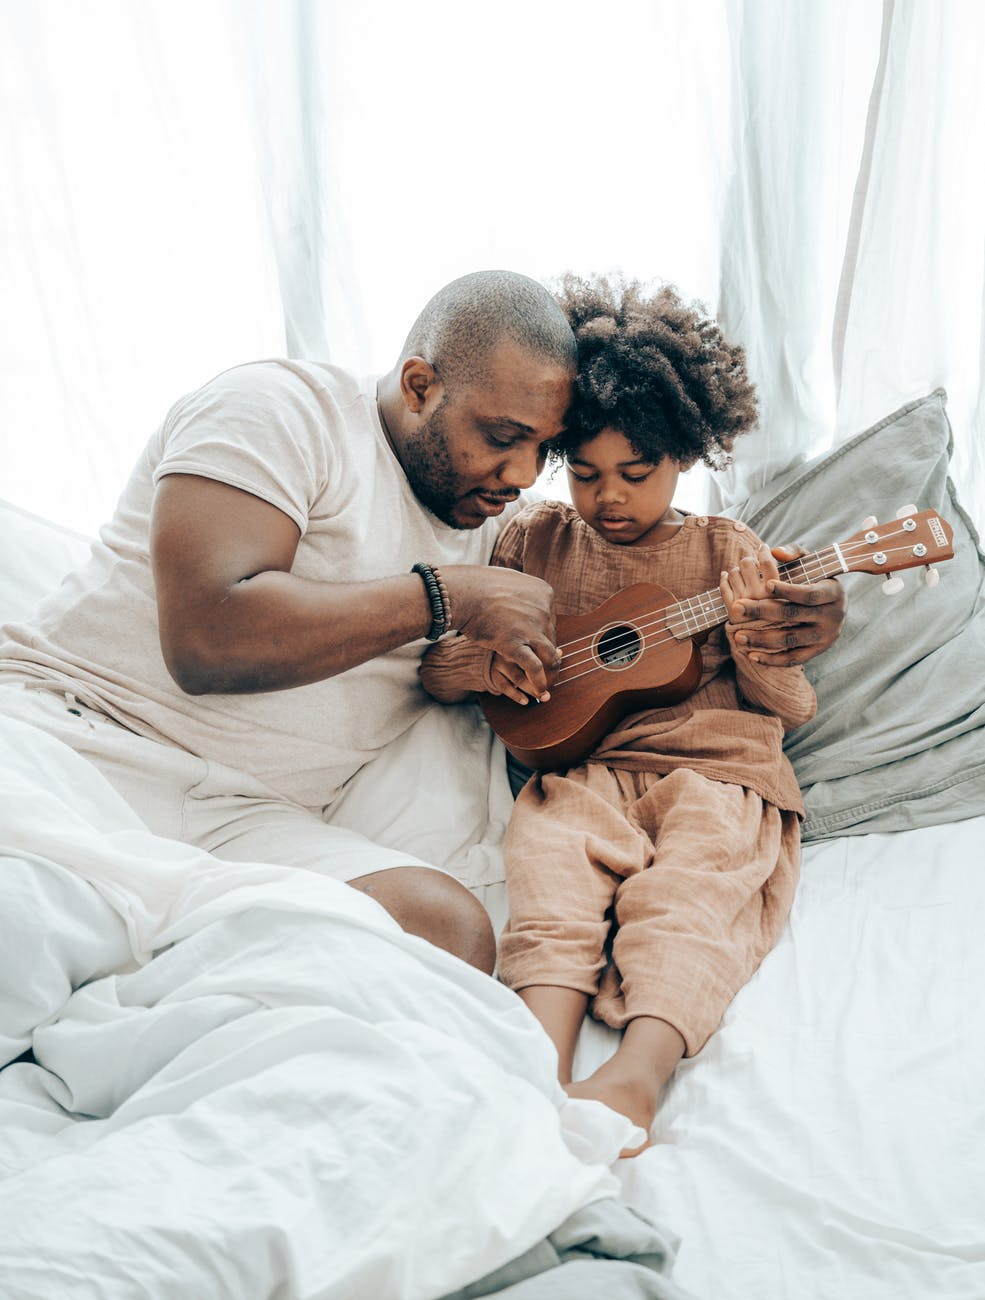 ethnic father teaching kid playing on ukulele at home